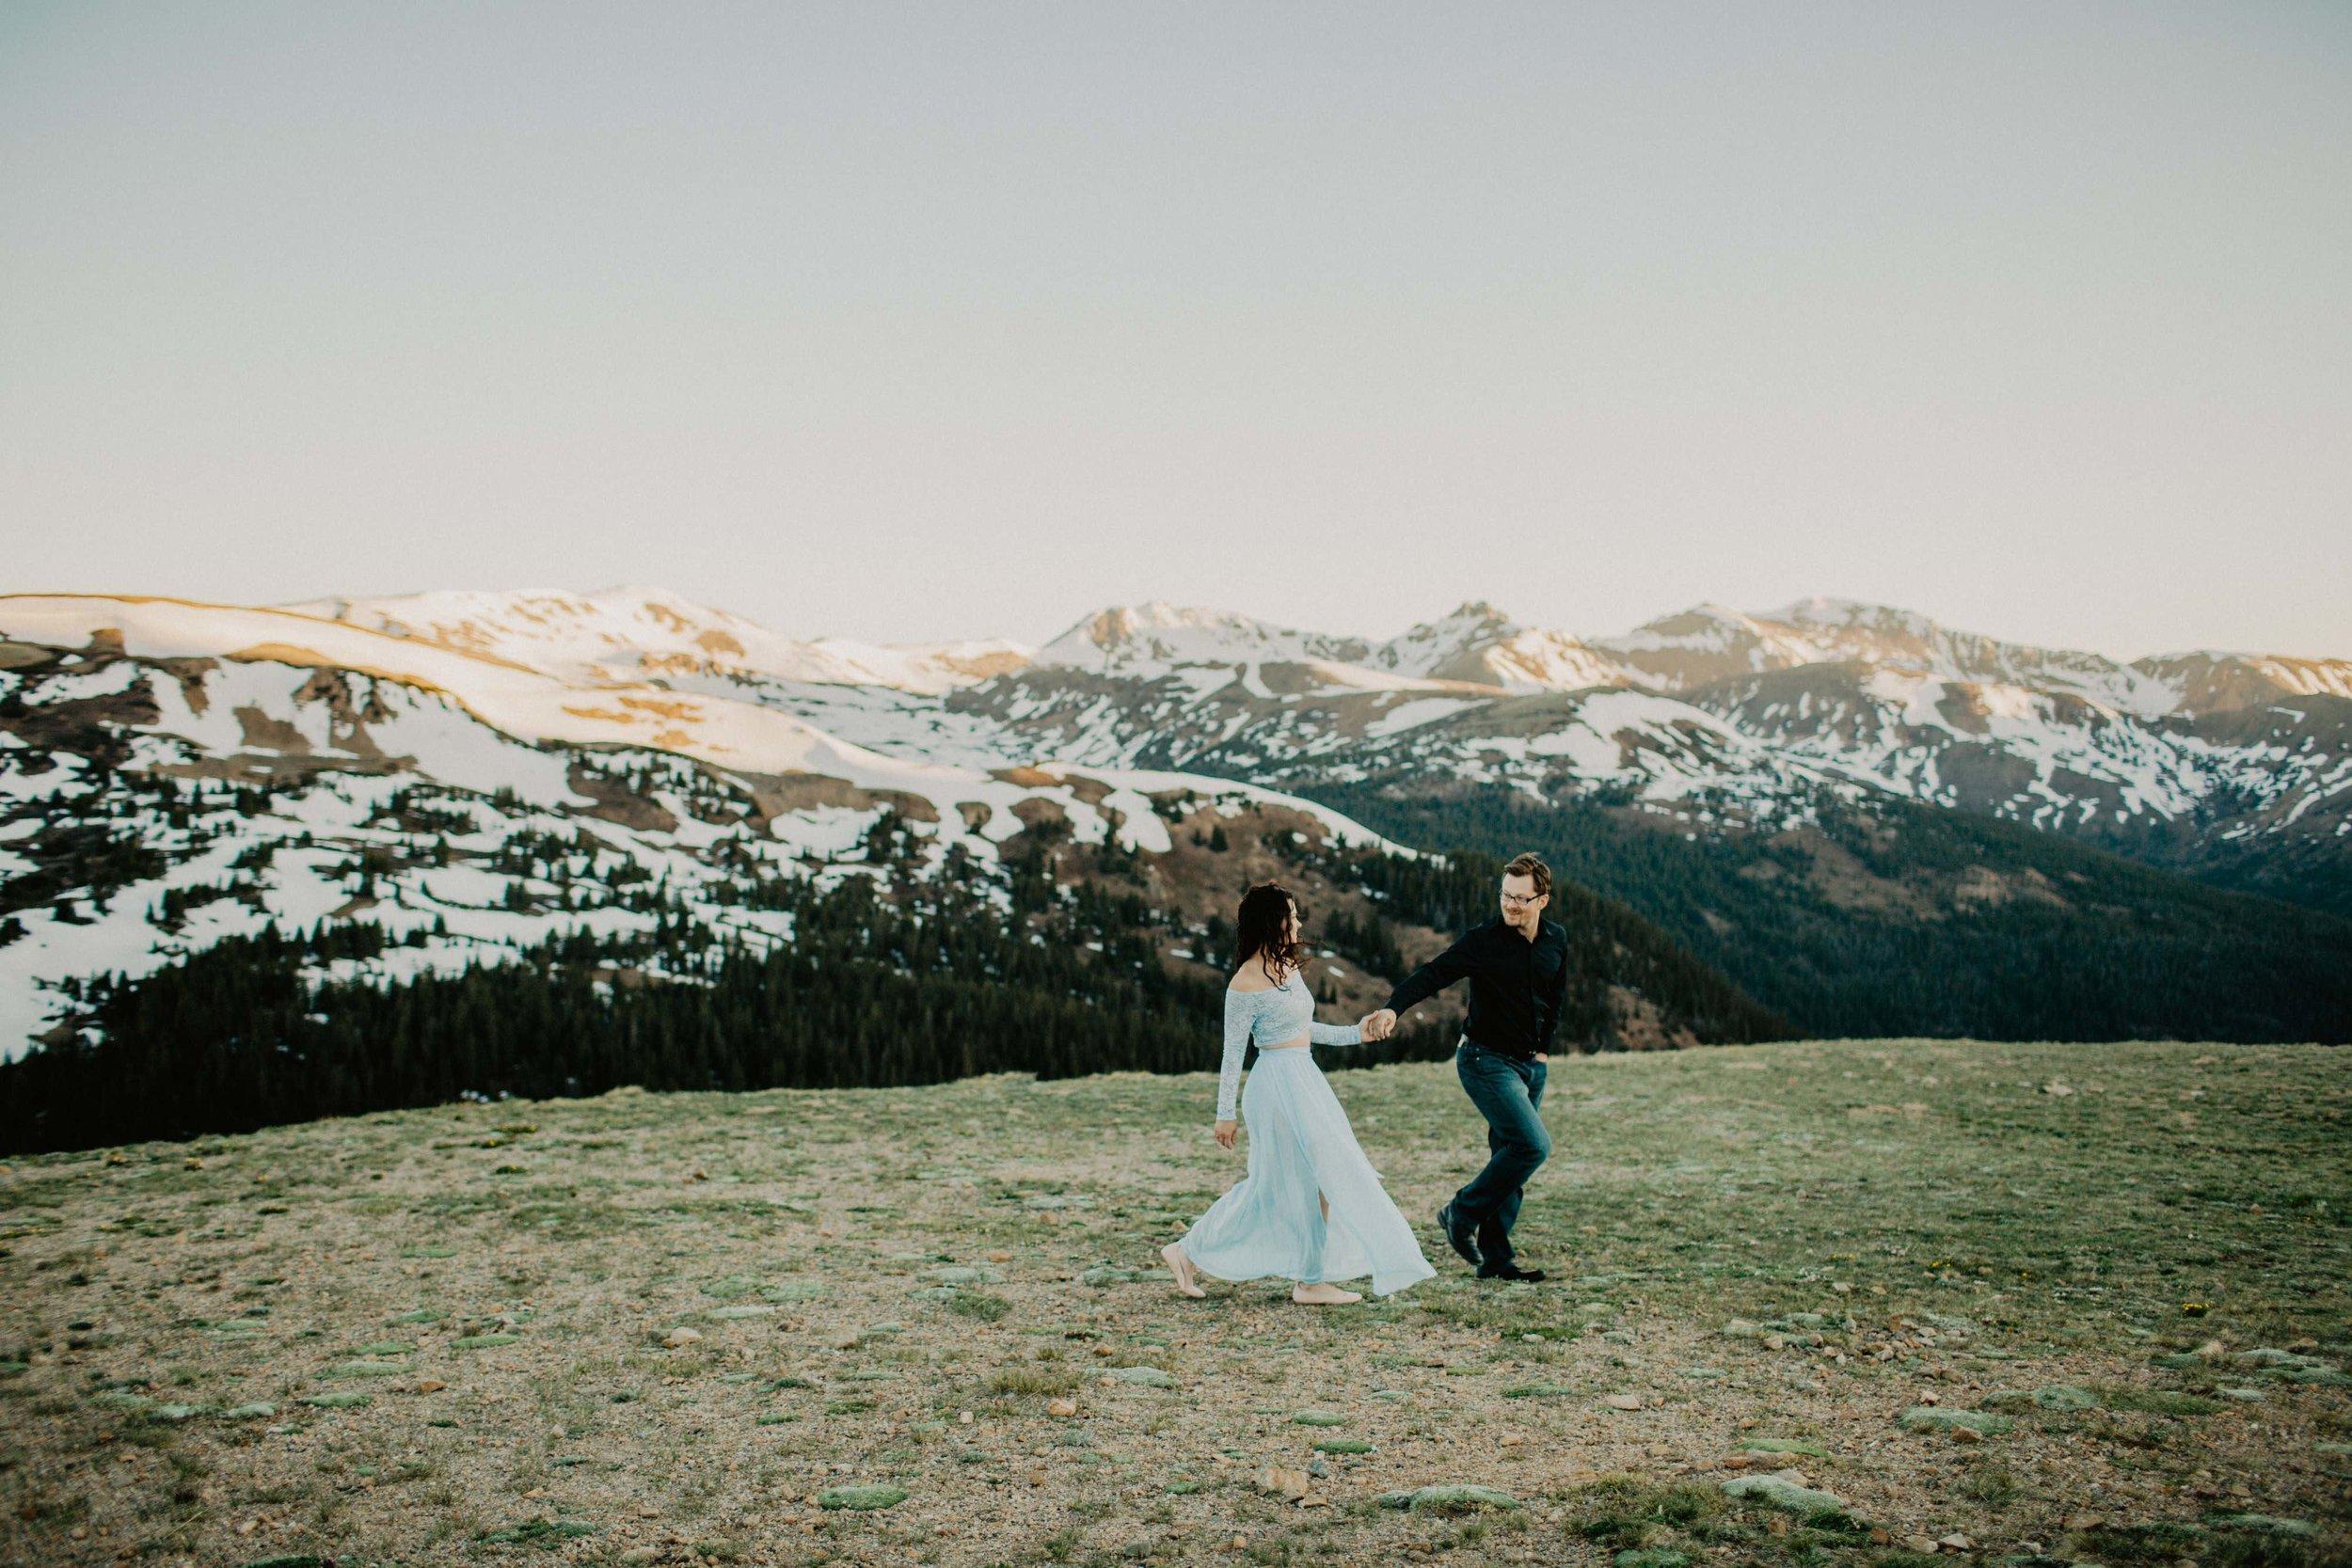 Kisa Conrad Favorites-0006-colorado-wedding-photographer-denver-springs-vail-.jpeg